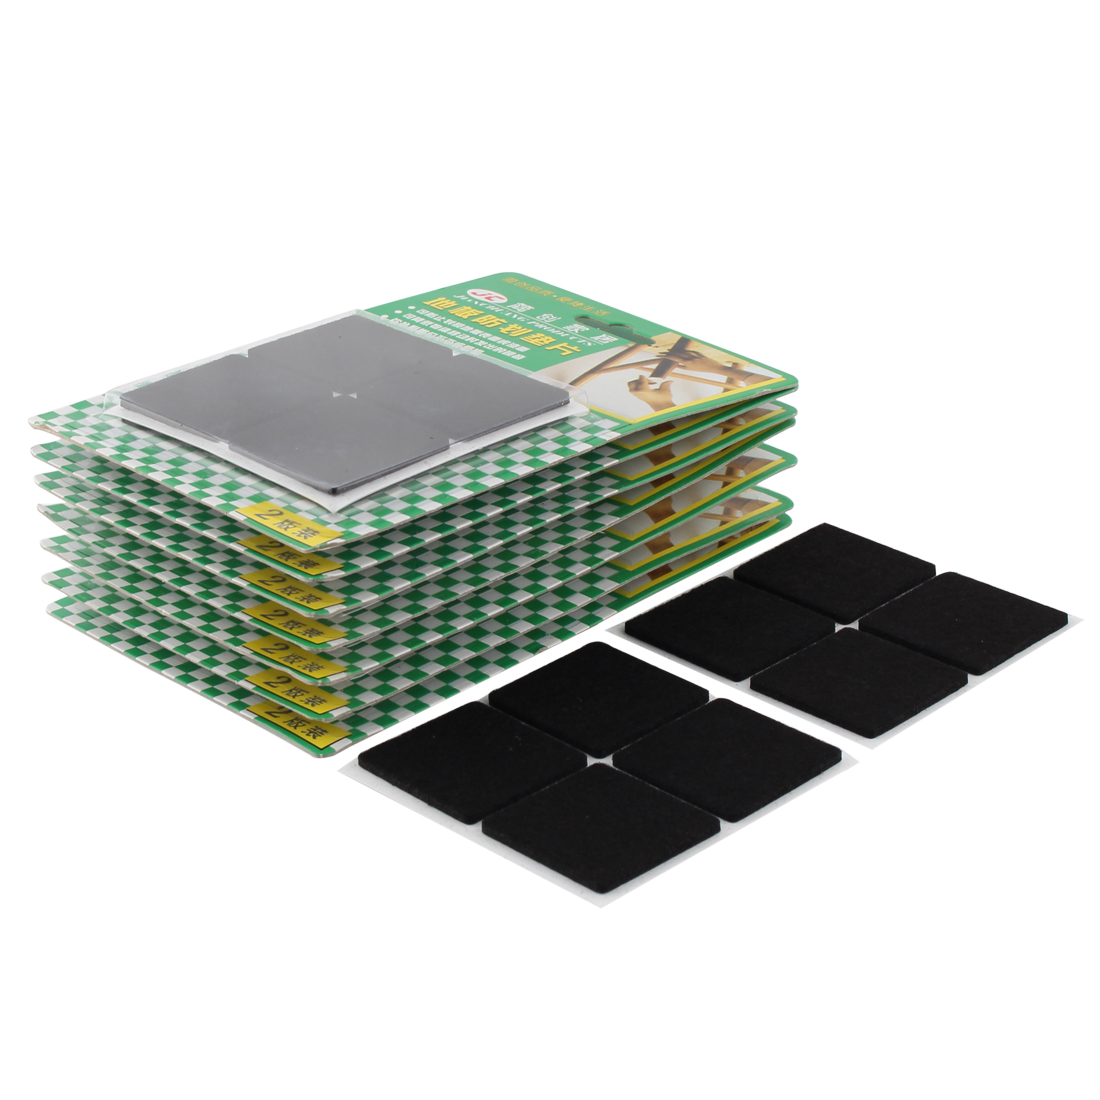 Table Chair Square Anti Slip Self Adhesive Furniture Felt Pads Cover Black 38 x 38mm 64pcs